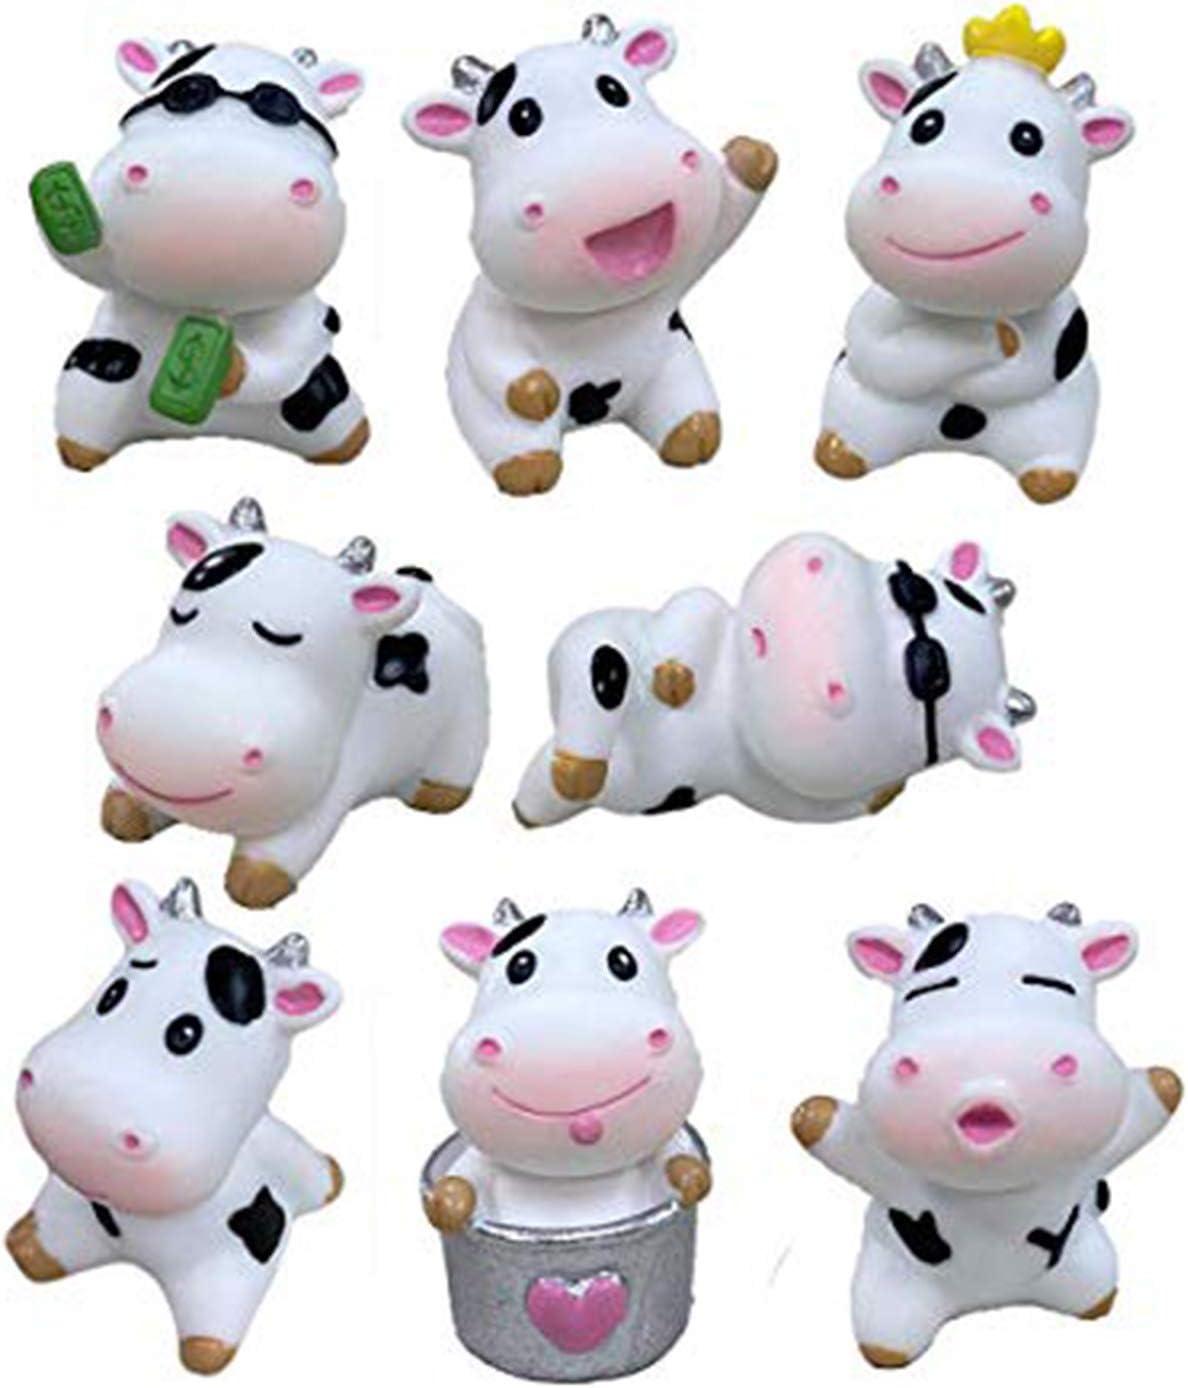 Beauy Girl 8pcs Mini Cow Animals Miniature Cow Figurines Fairy Garden Miniature Cattle Farm Figurines DIY Terrarium Crafts Moss Landscape Ornament Plant Pot Craft Dollhouse Decoration